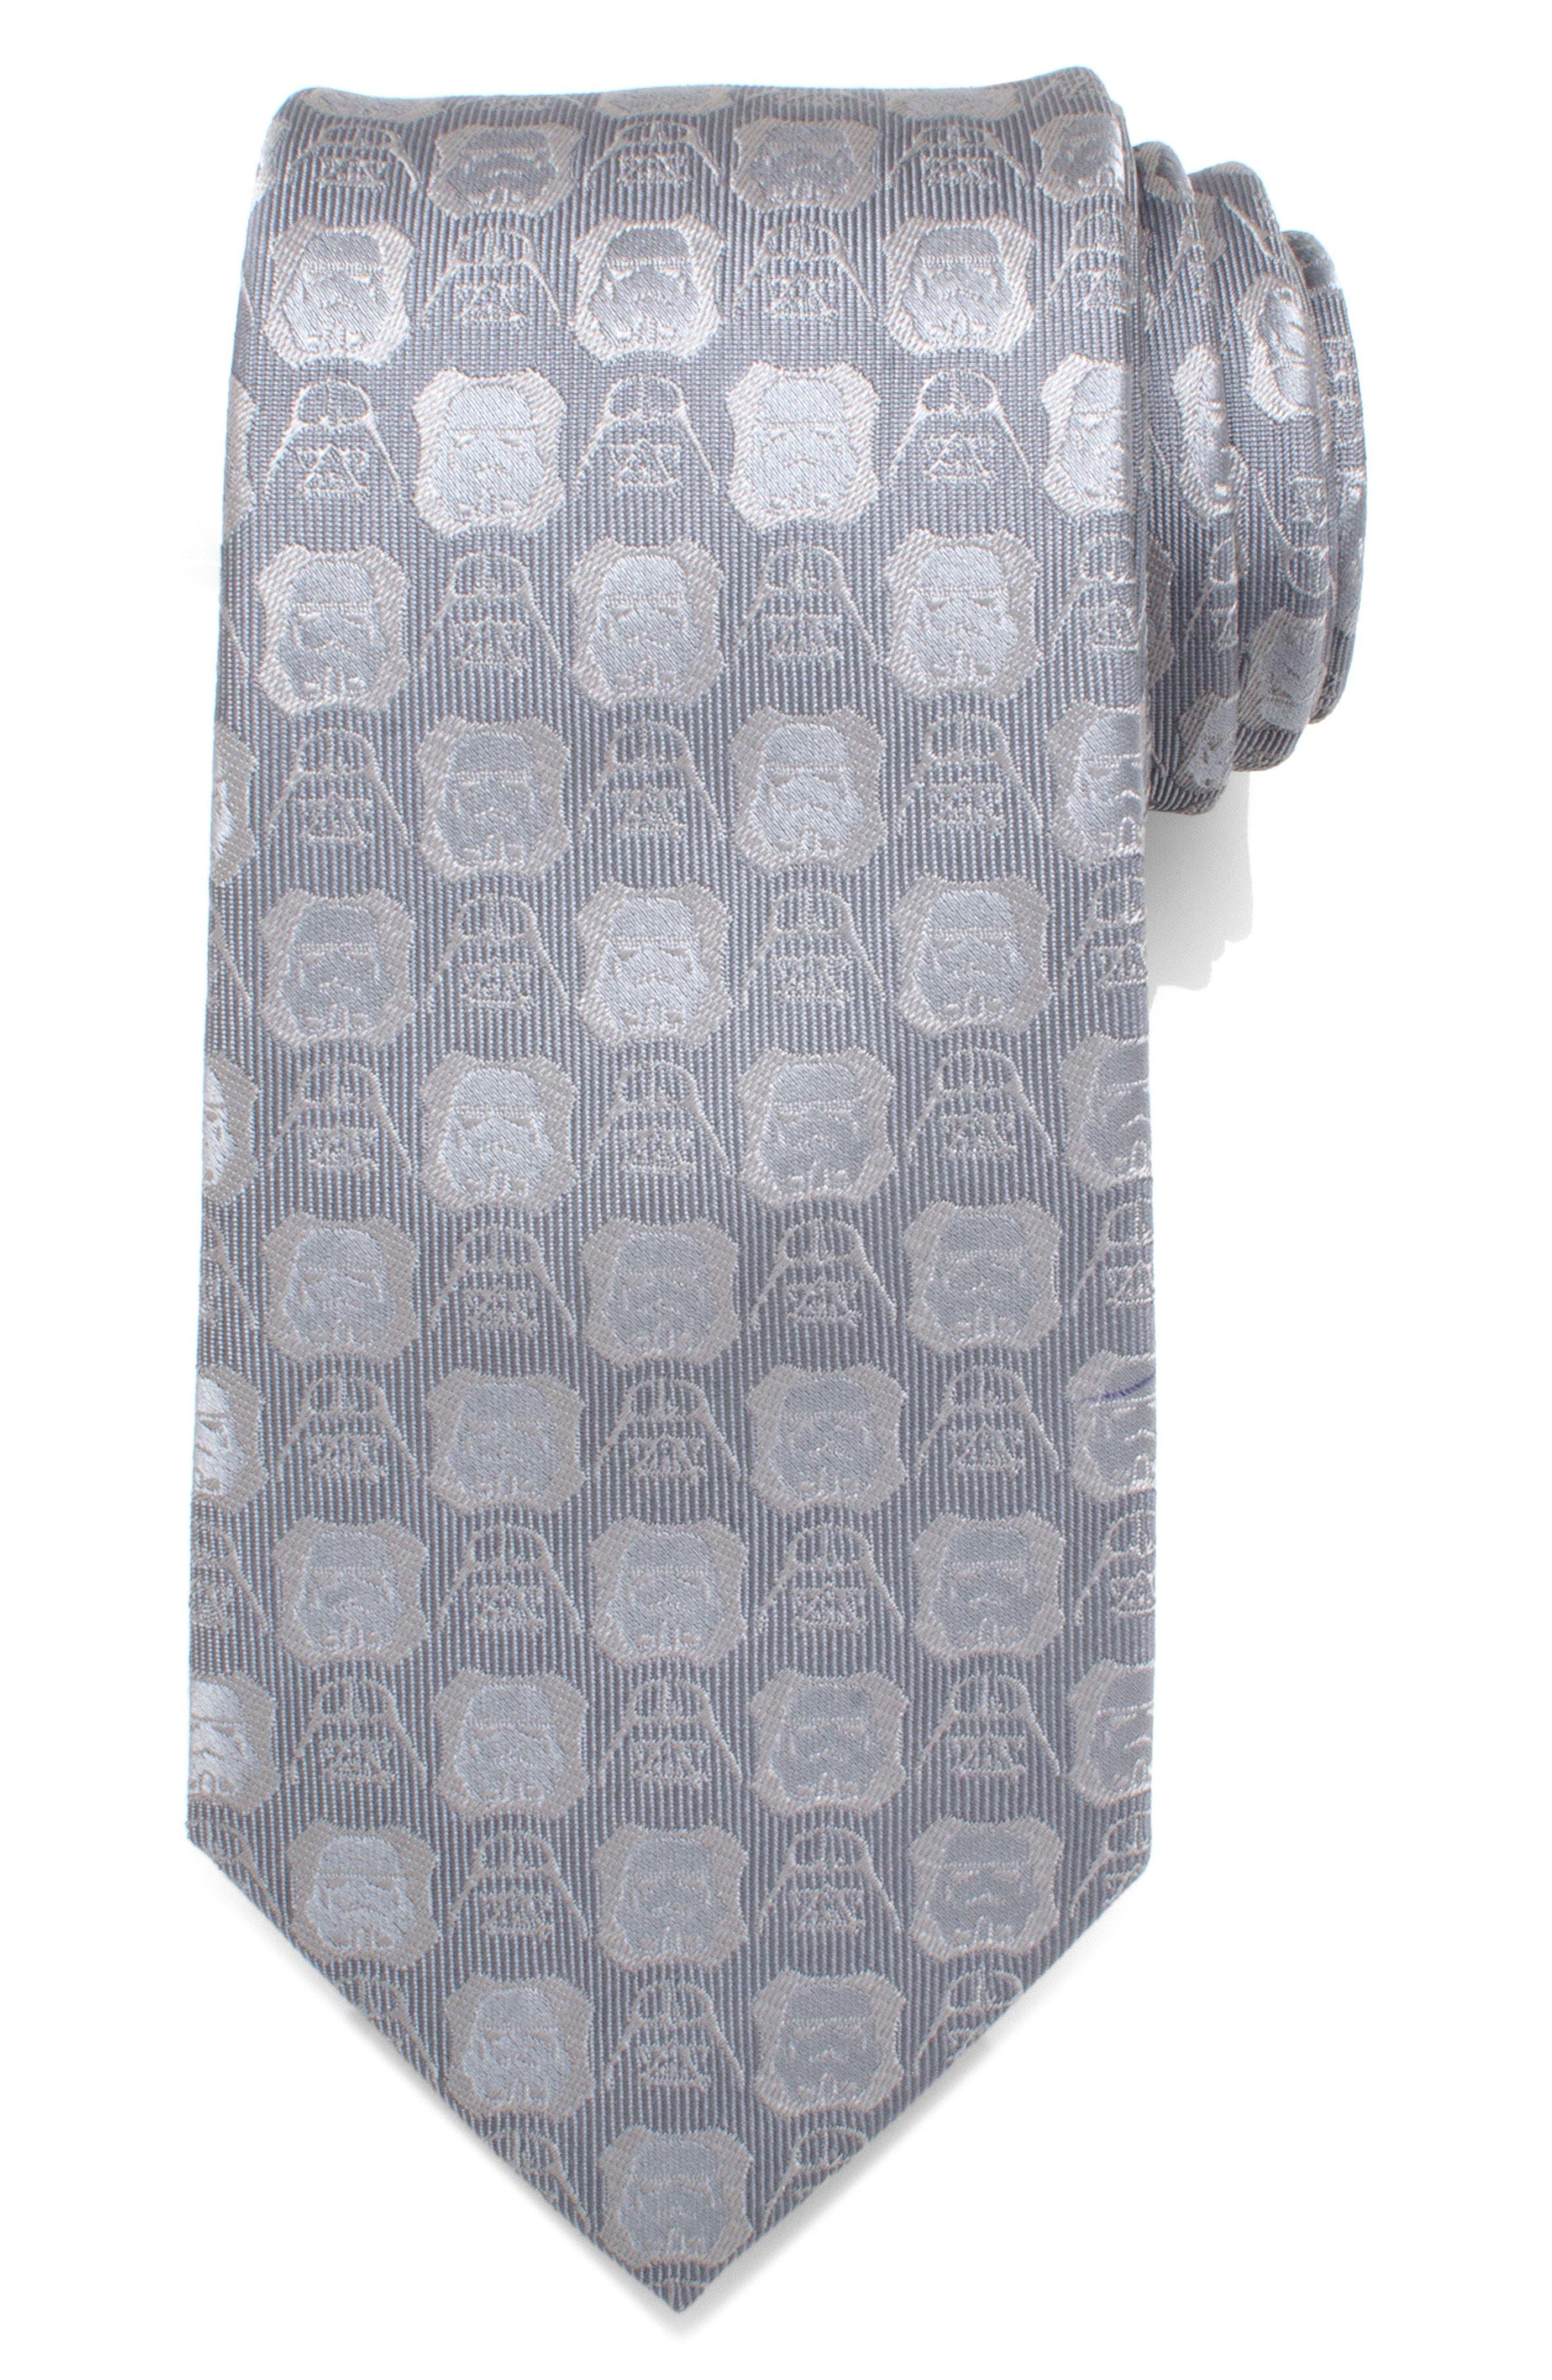 Star Wars<sup>™</sup> Darth Vader Medallion Silk Tie,                         Main,                         color, Gray